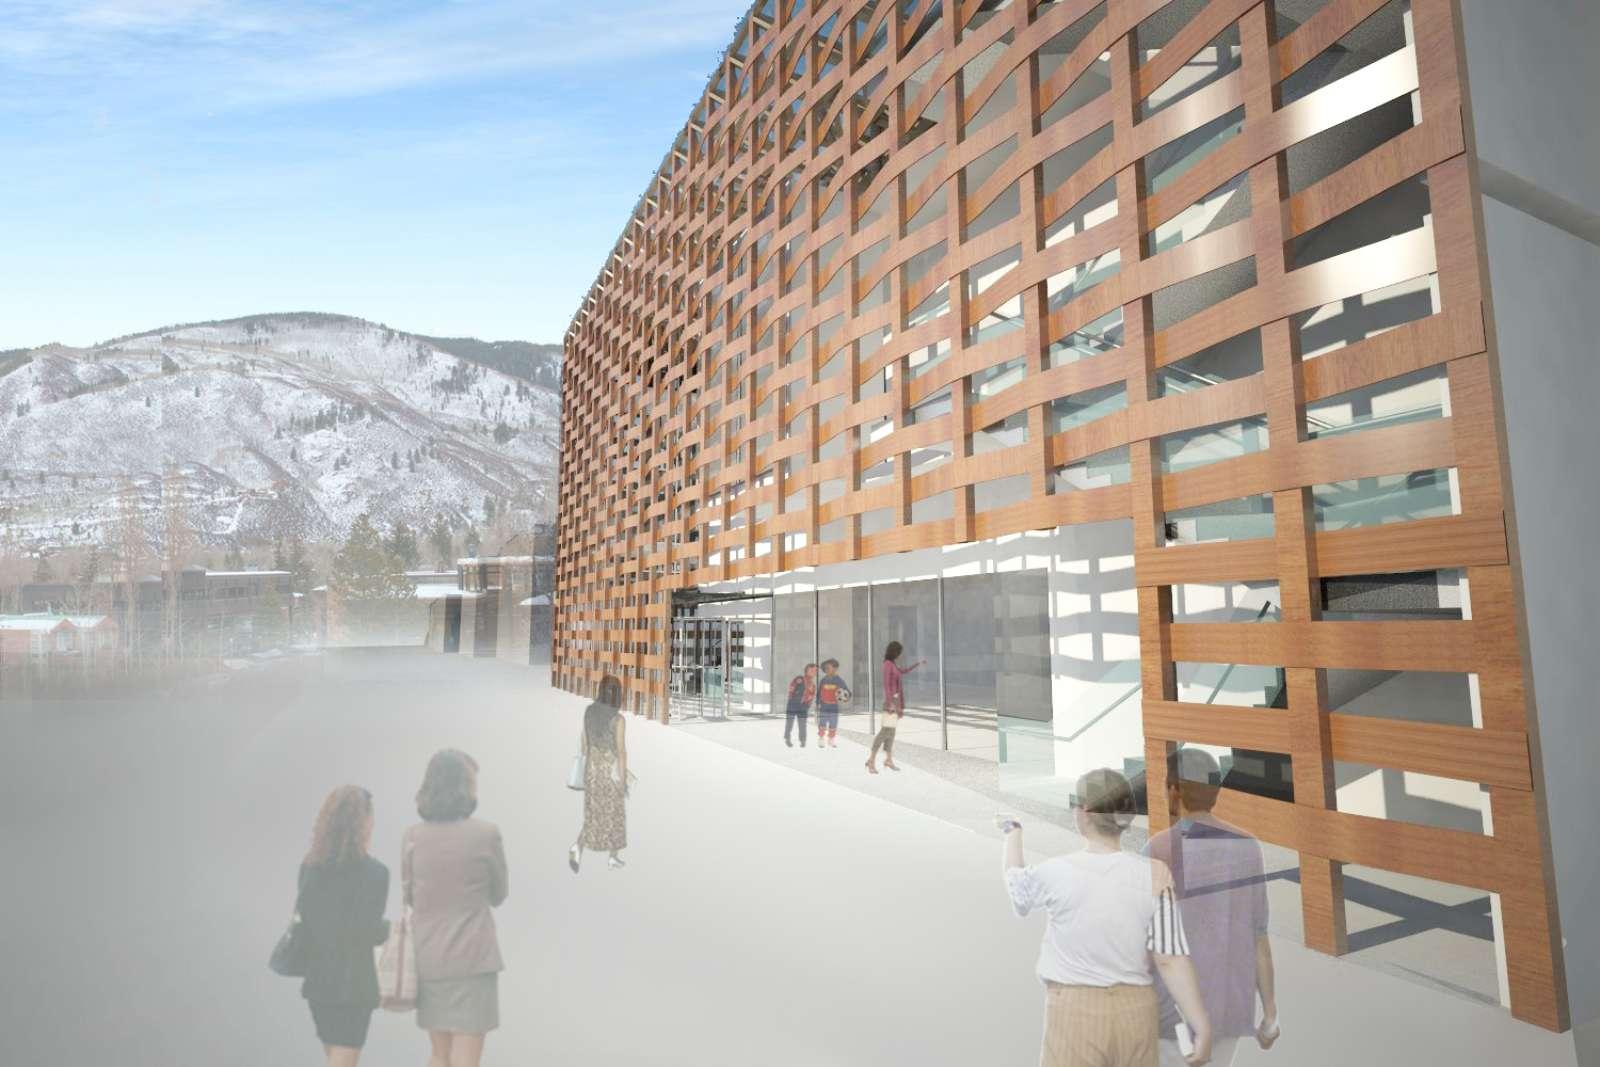 03-Aspen-Art-Museum por Shigeru Ban---junto abierto-verano